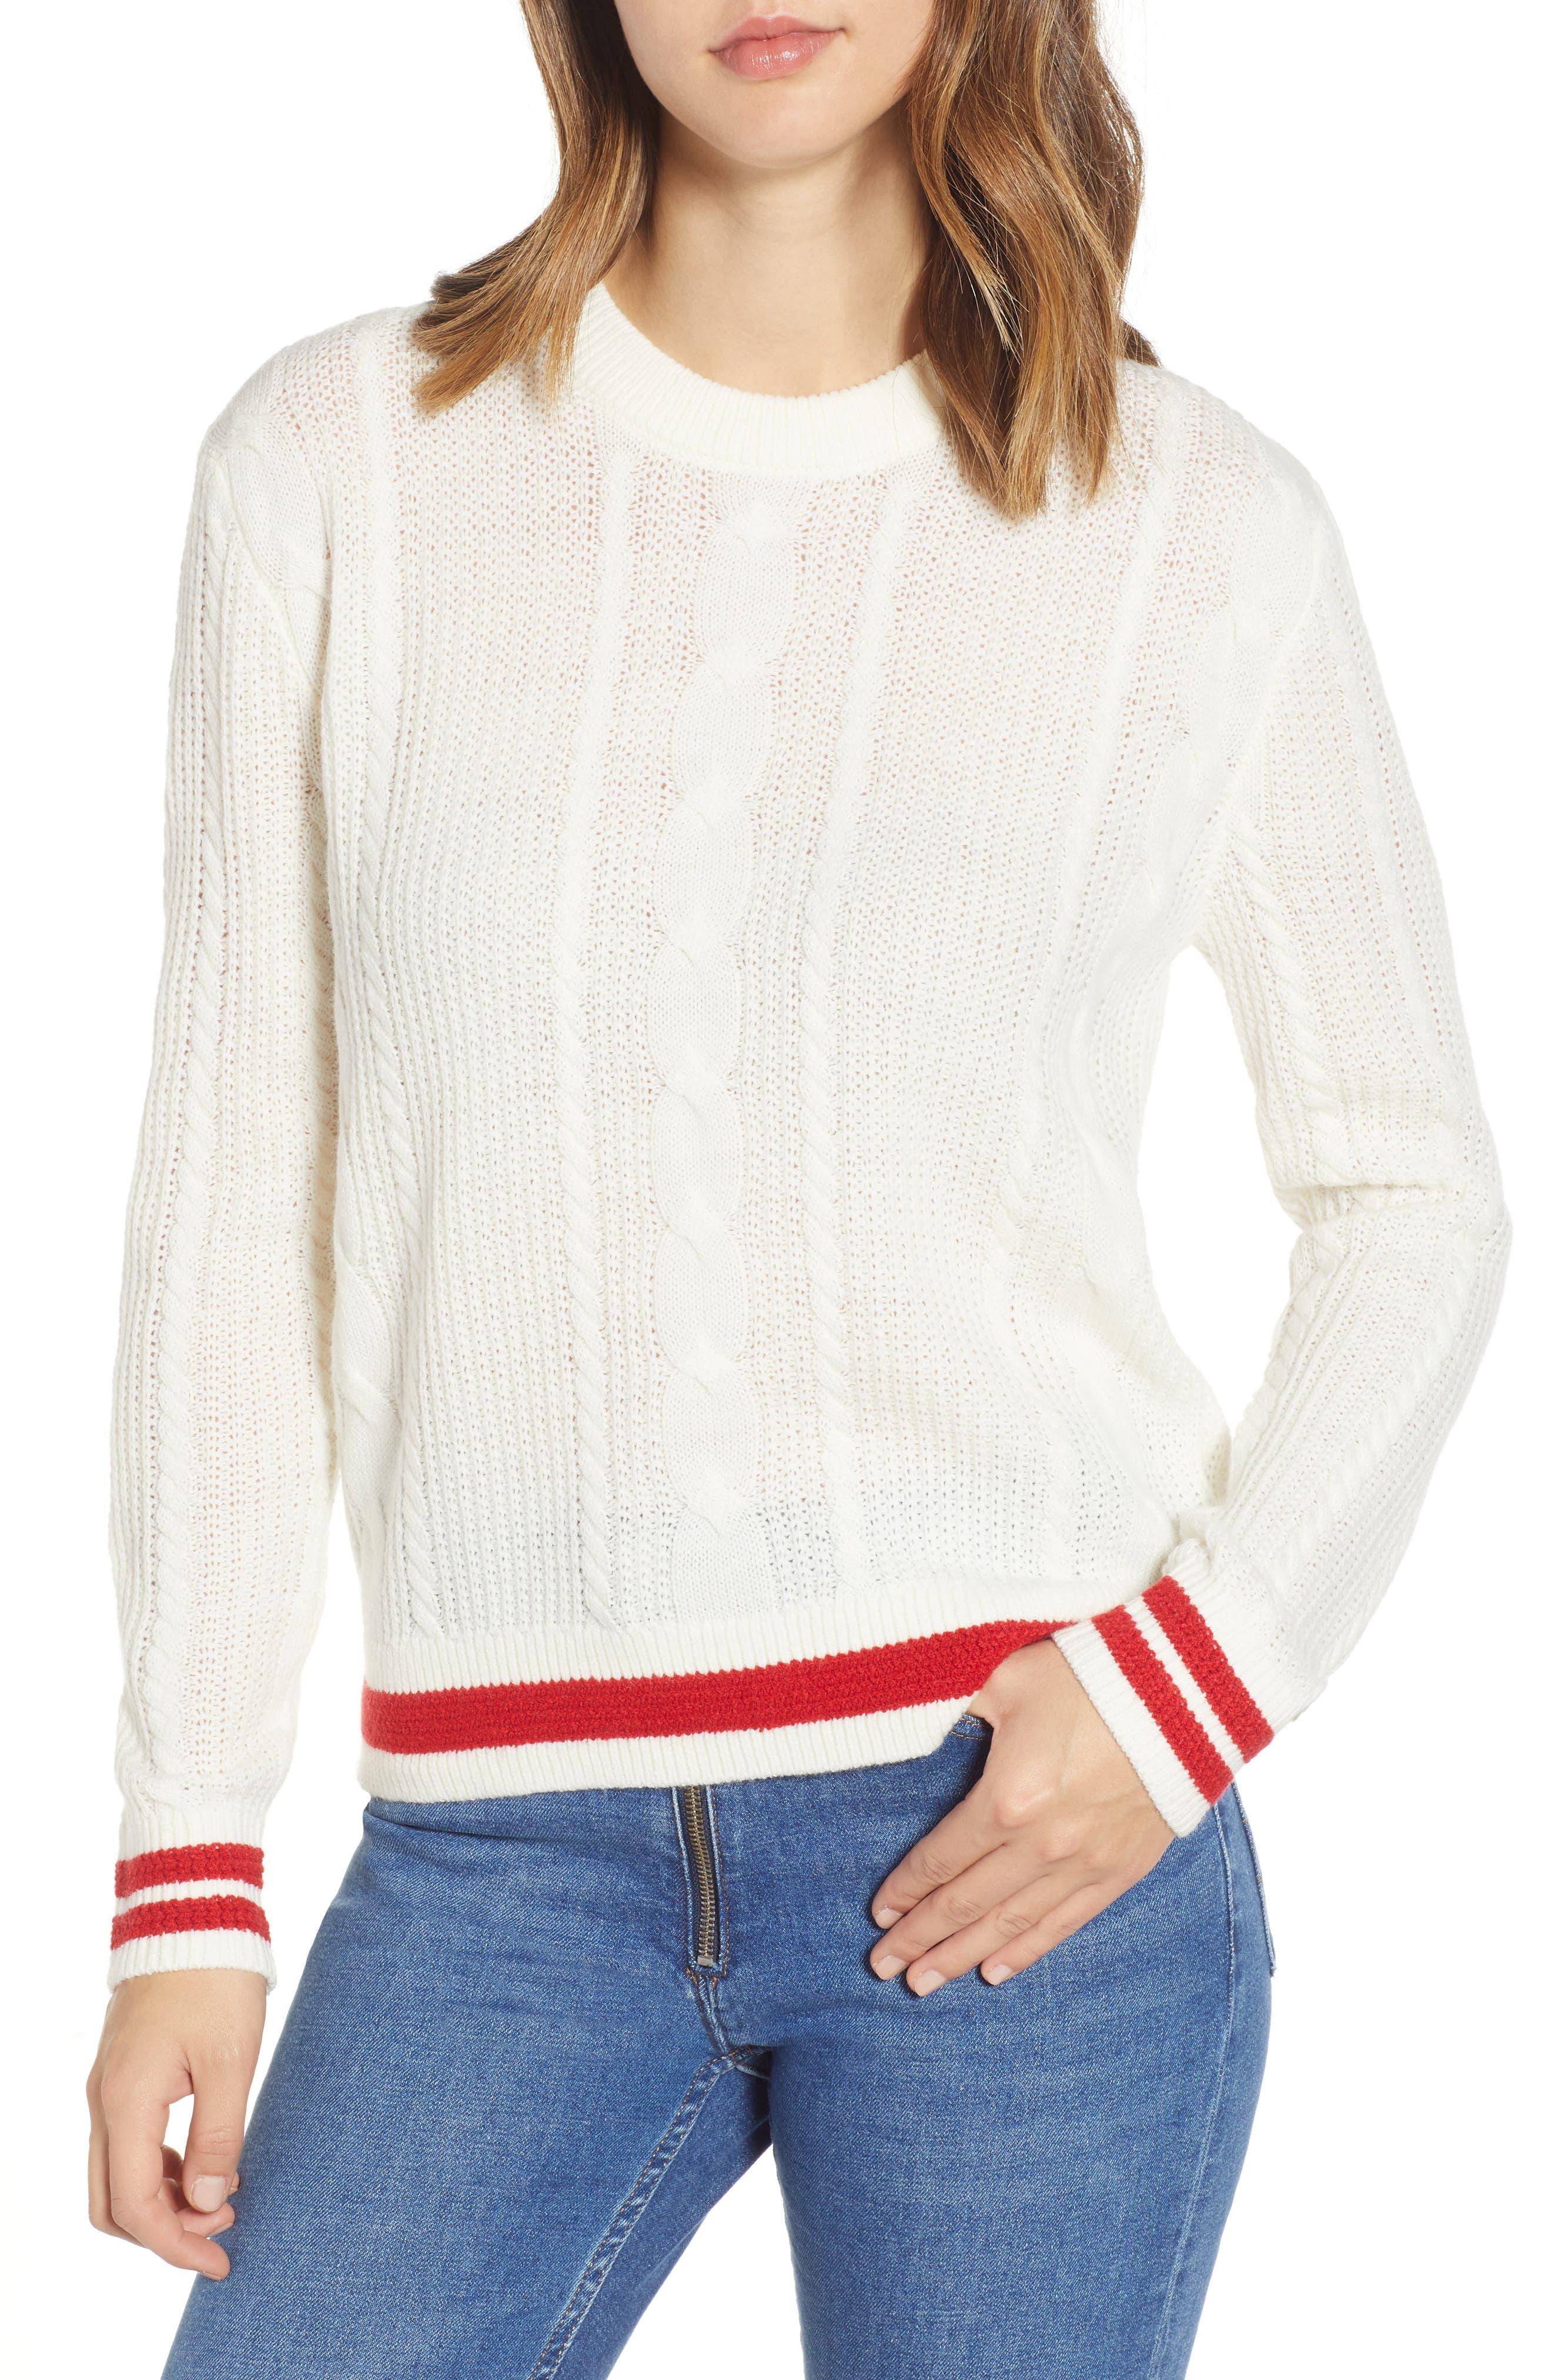 TJW Cable Knit Sweater,                             Main thumbnail 1, color,                             CLOUD DANCER